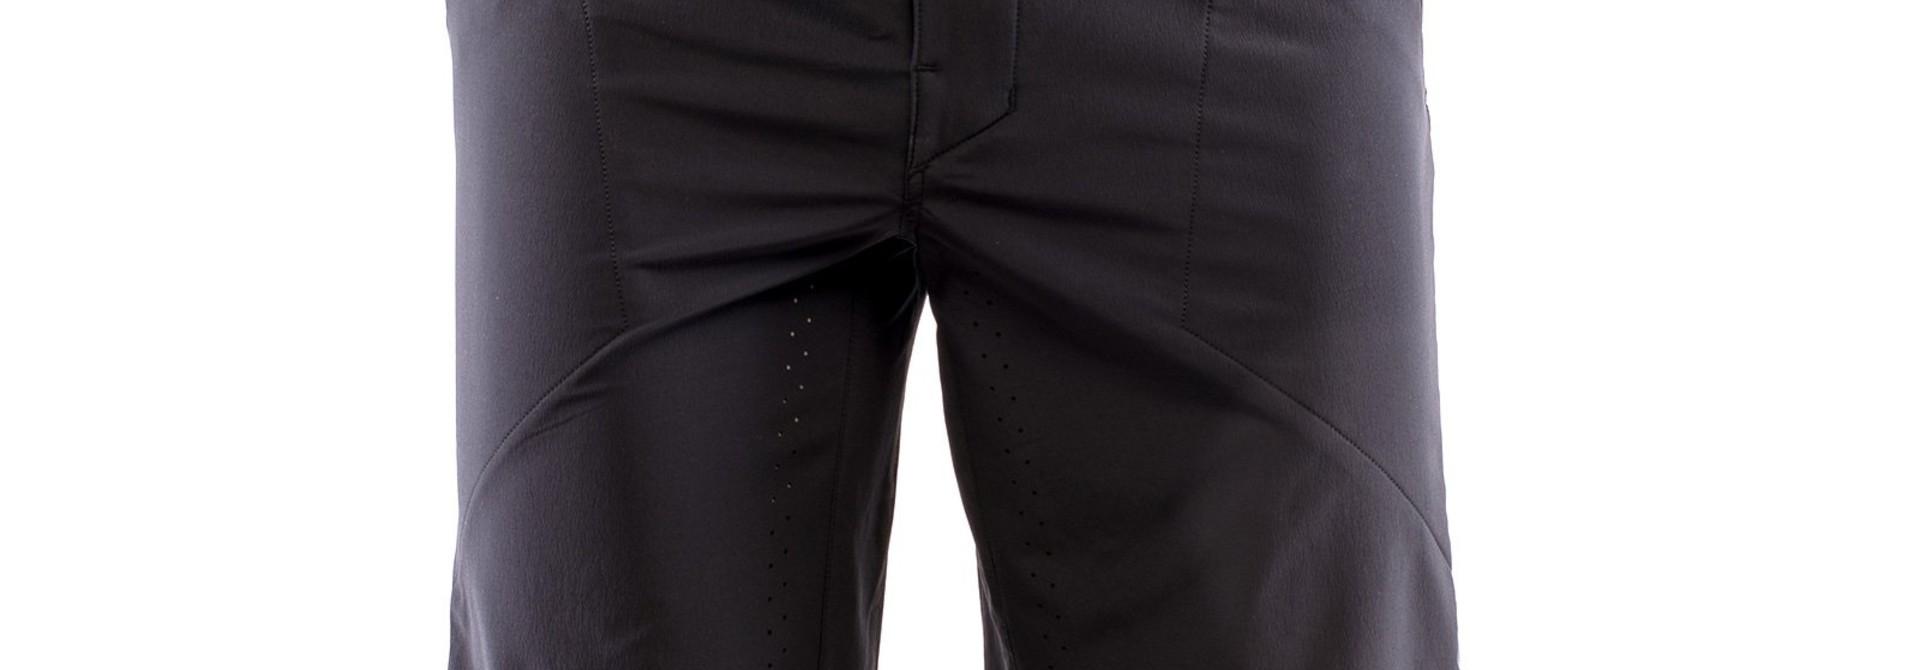 Chromag Ambits Shorts Mens